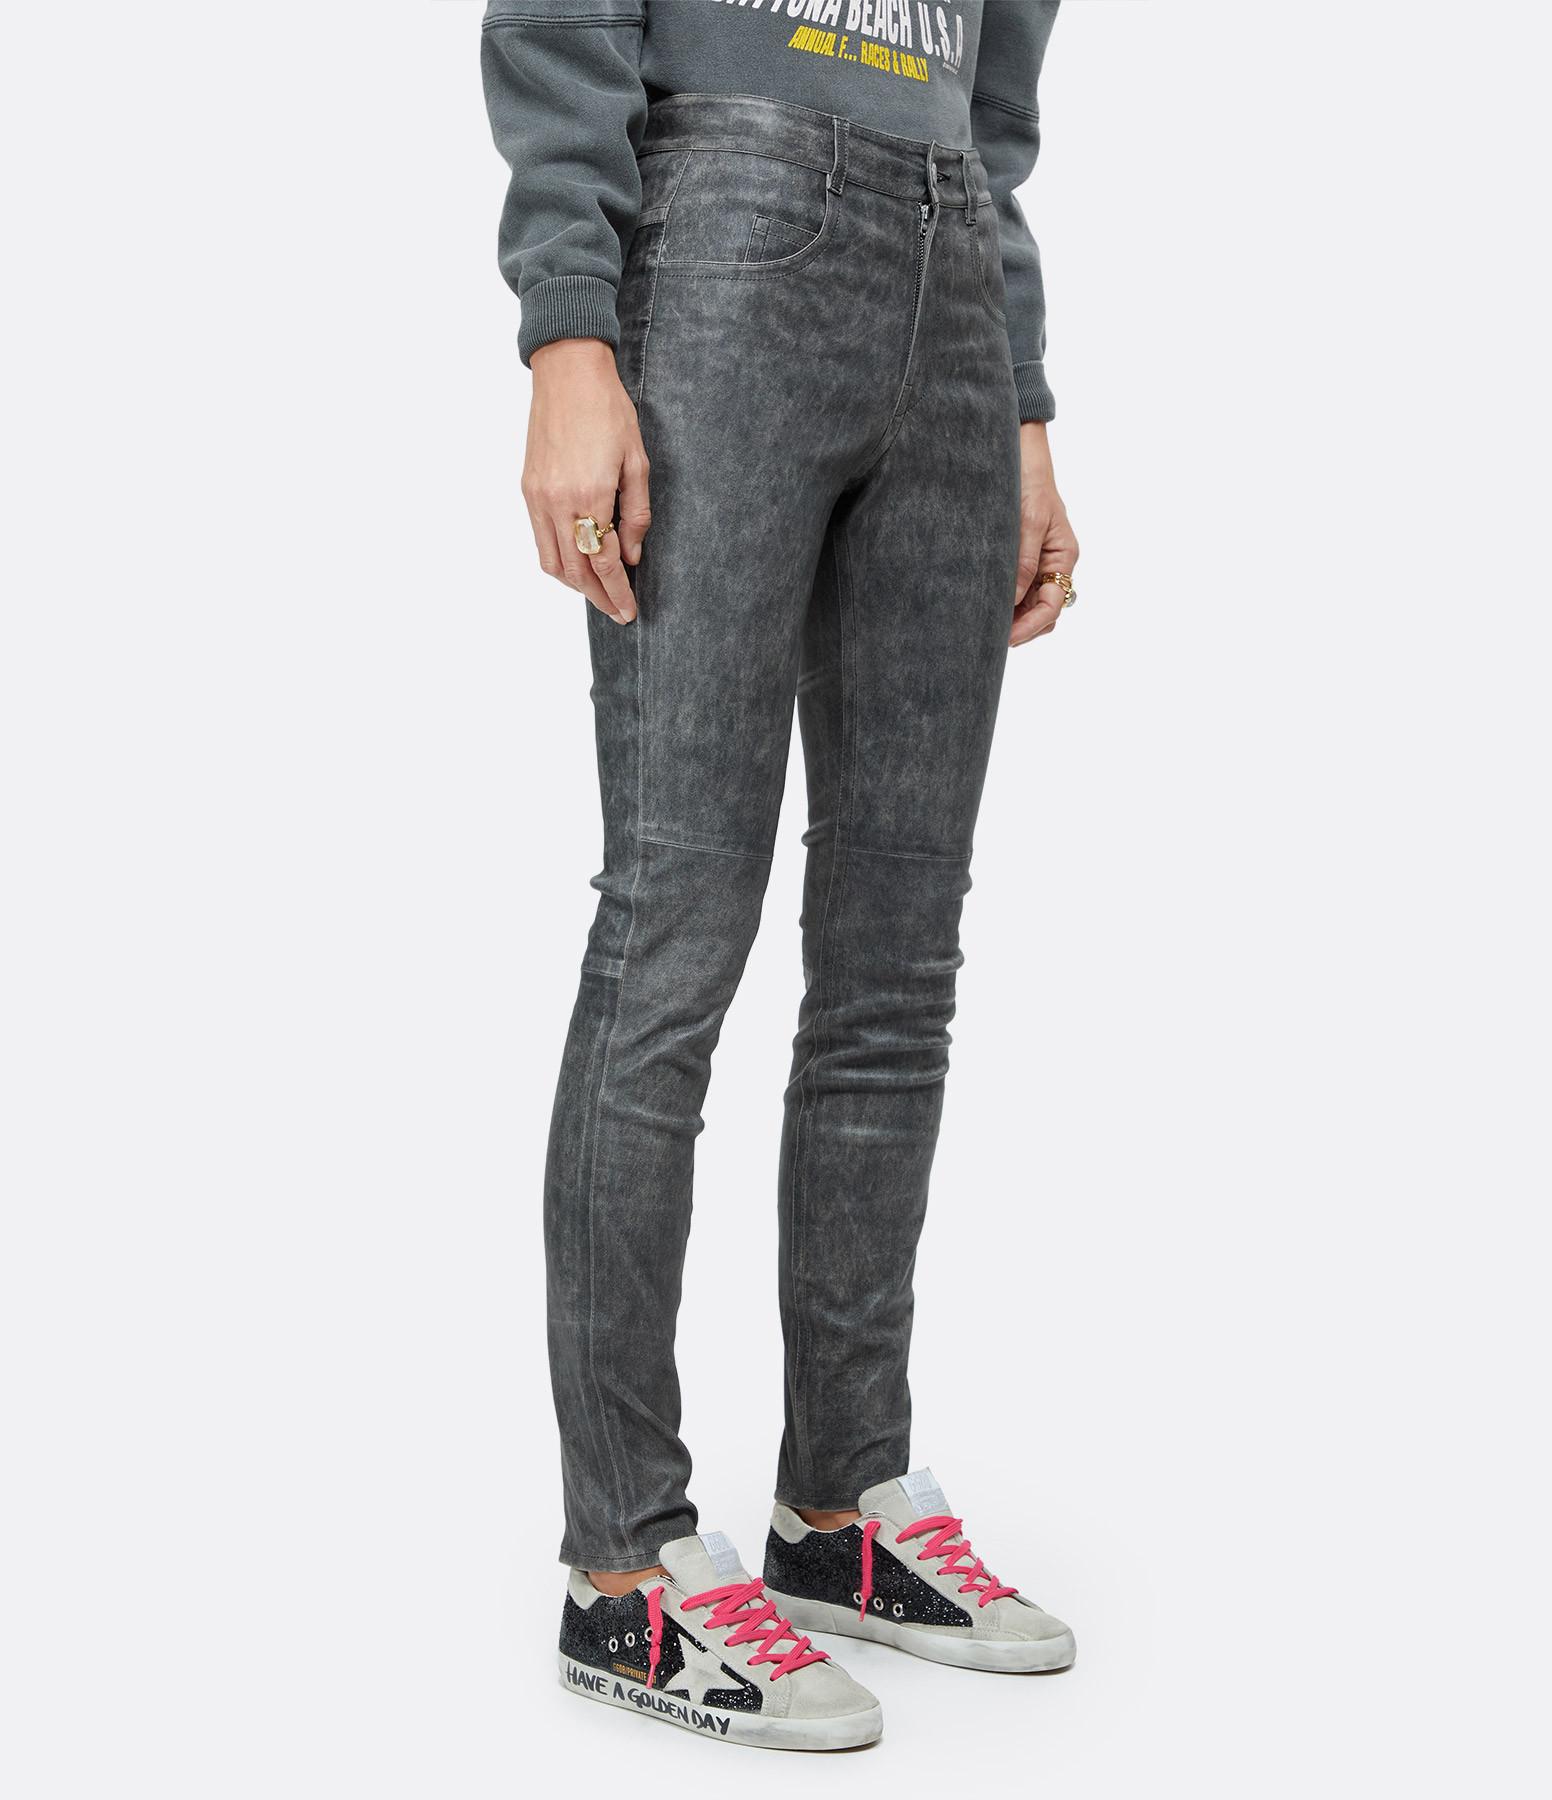 ISABEL MARANT ÉTOILE - Pantalon Taro Cuir Noir